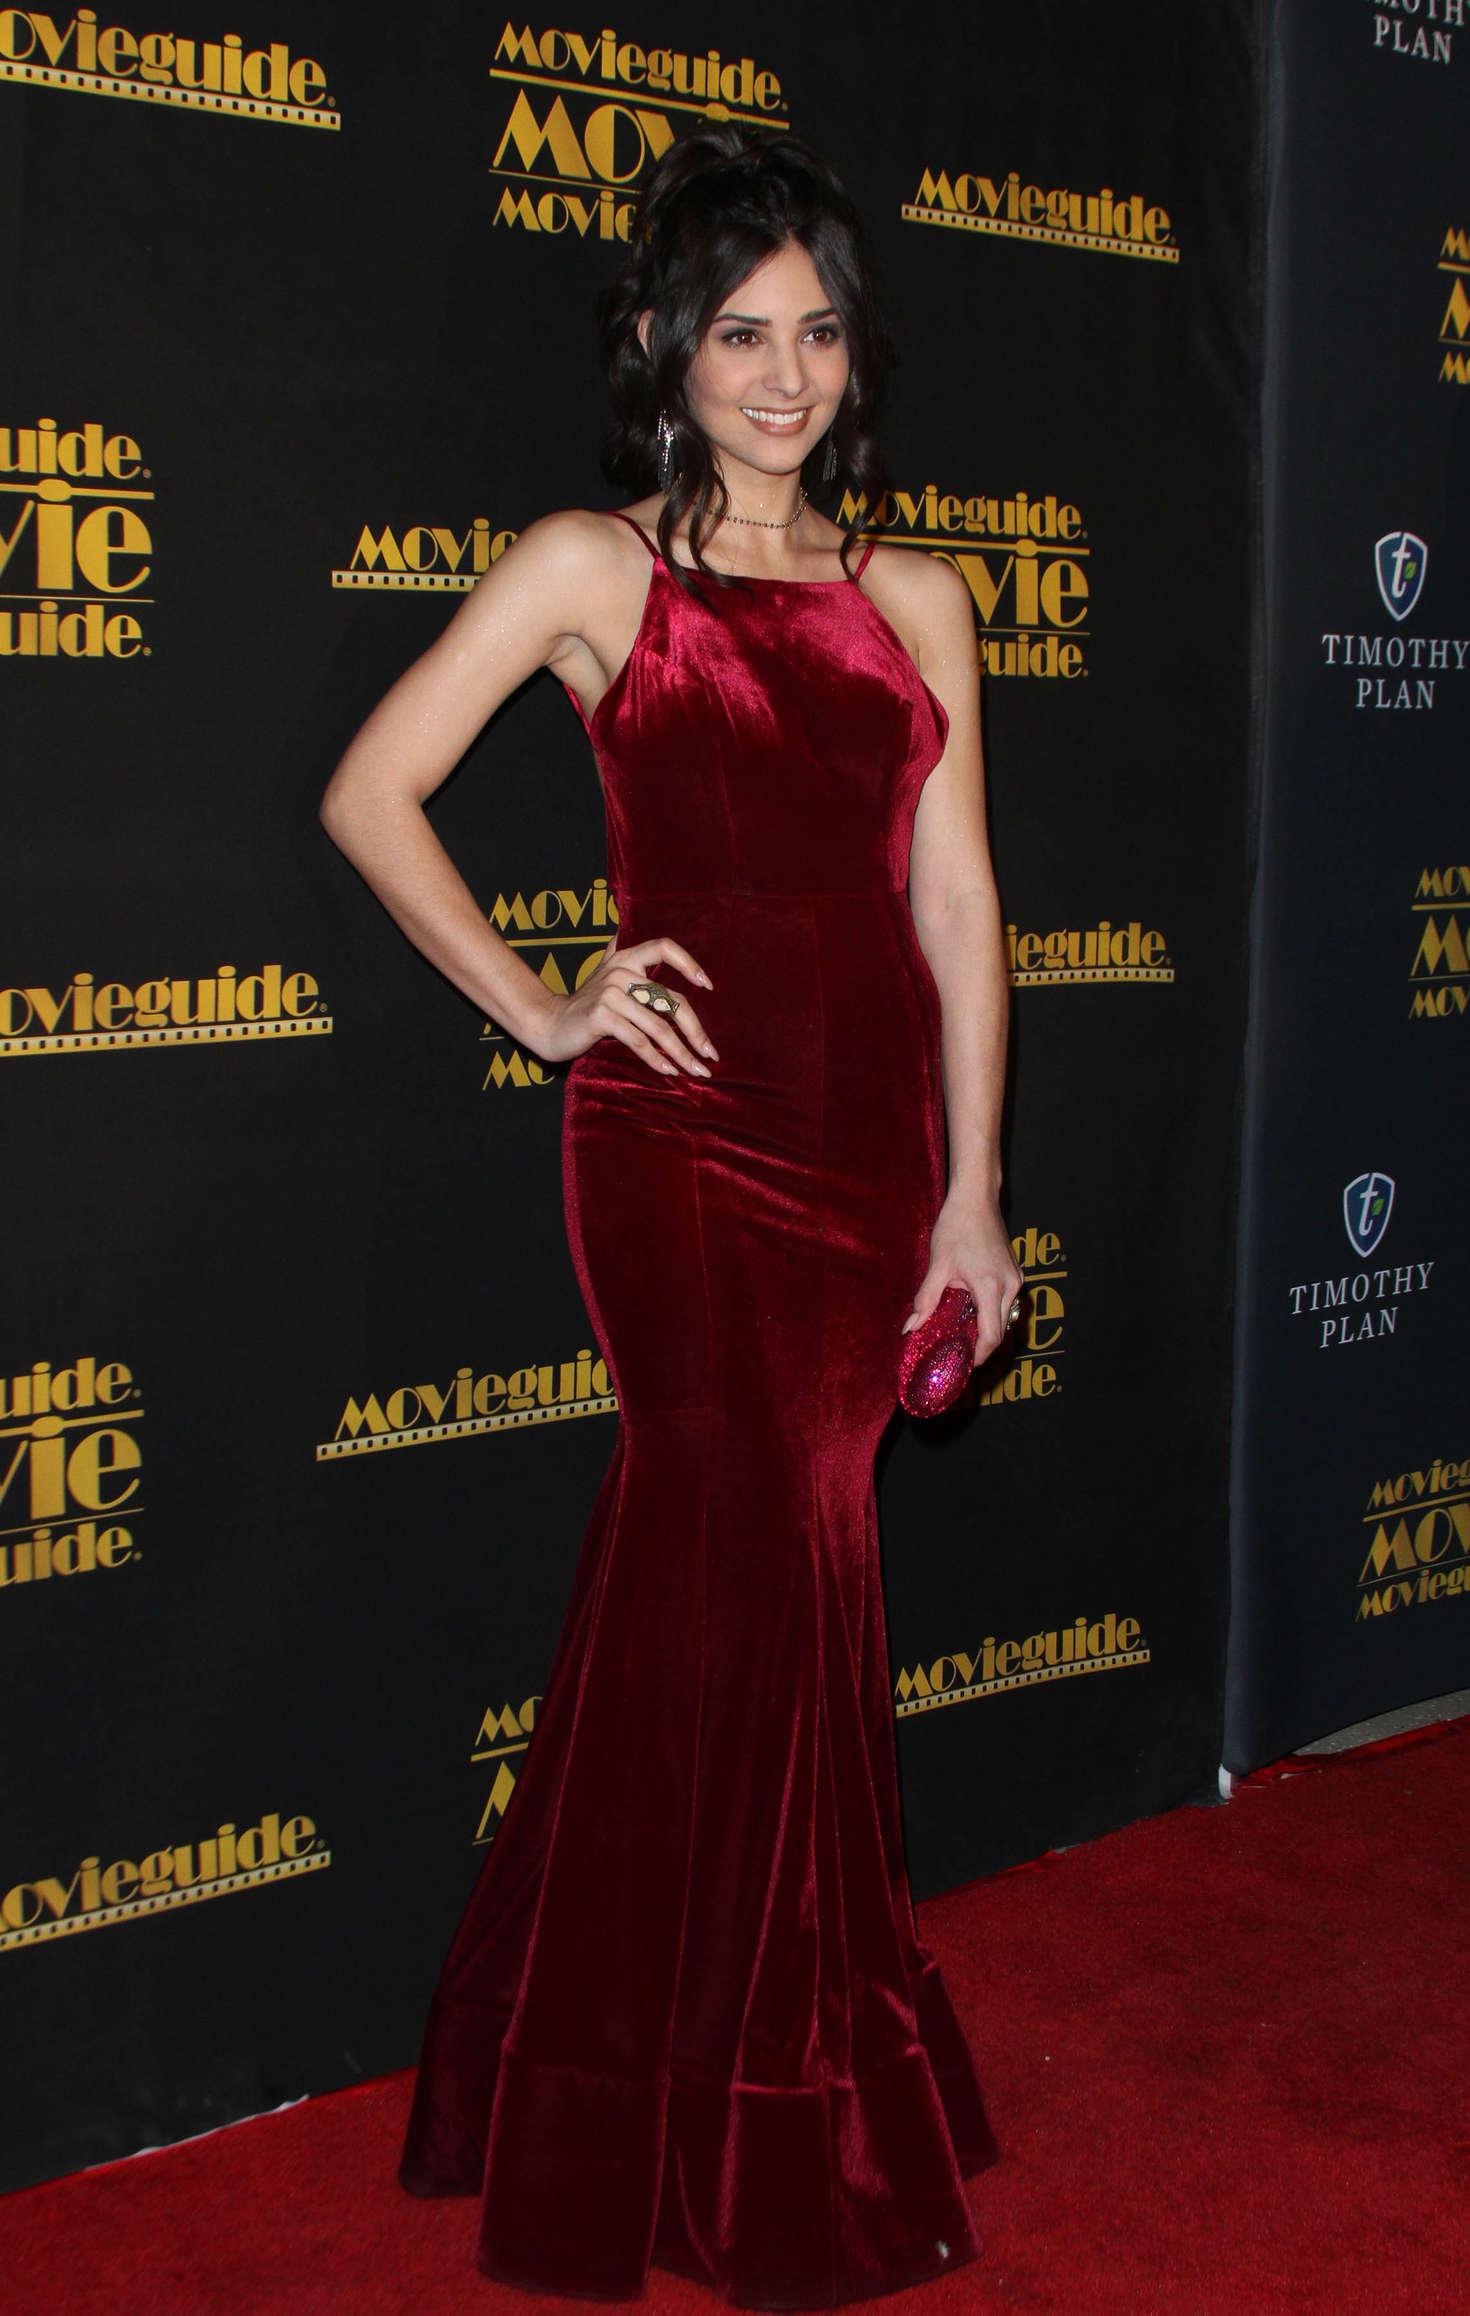 Camila Banus Annual MovieGuide Awards in Los Angeles